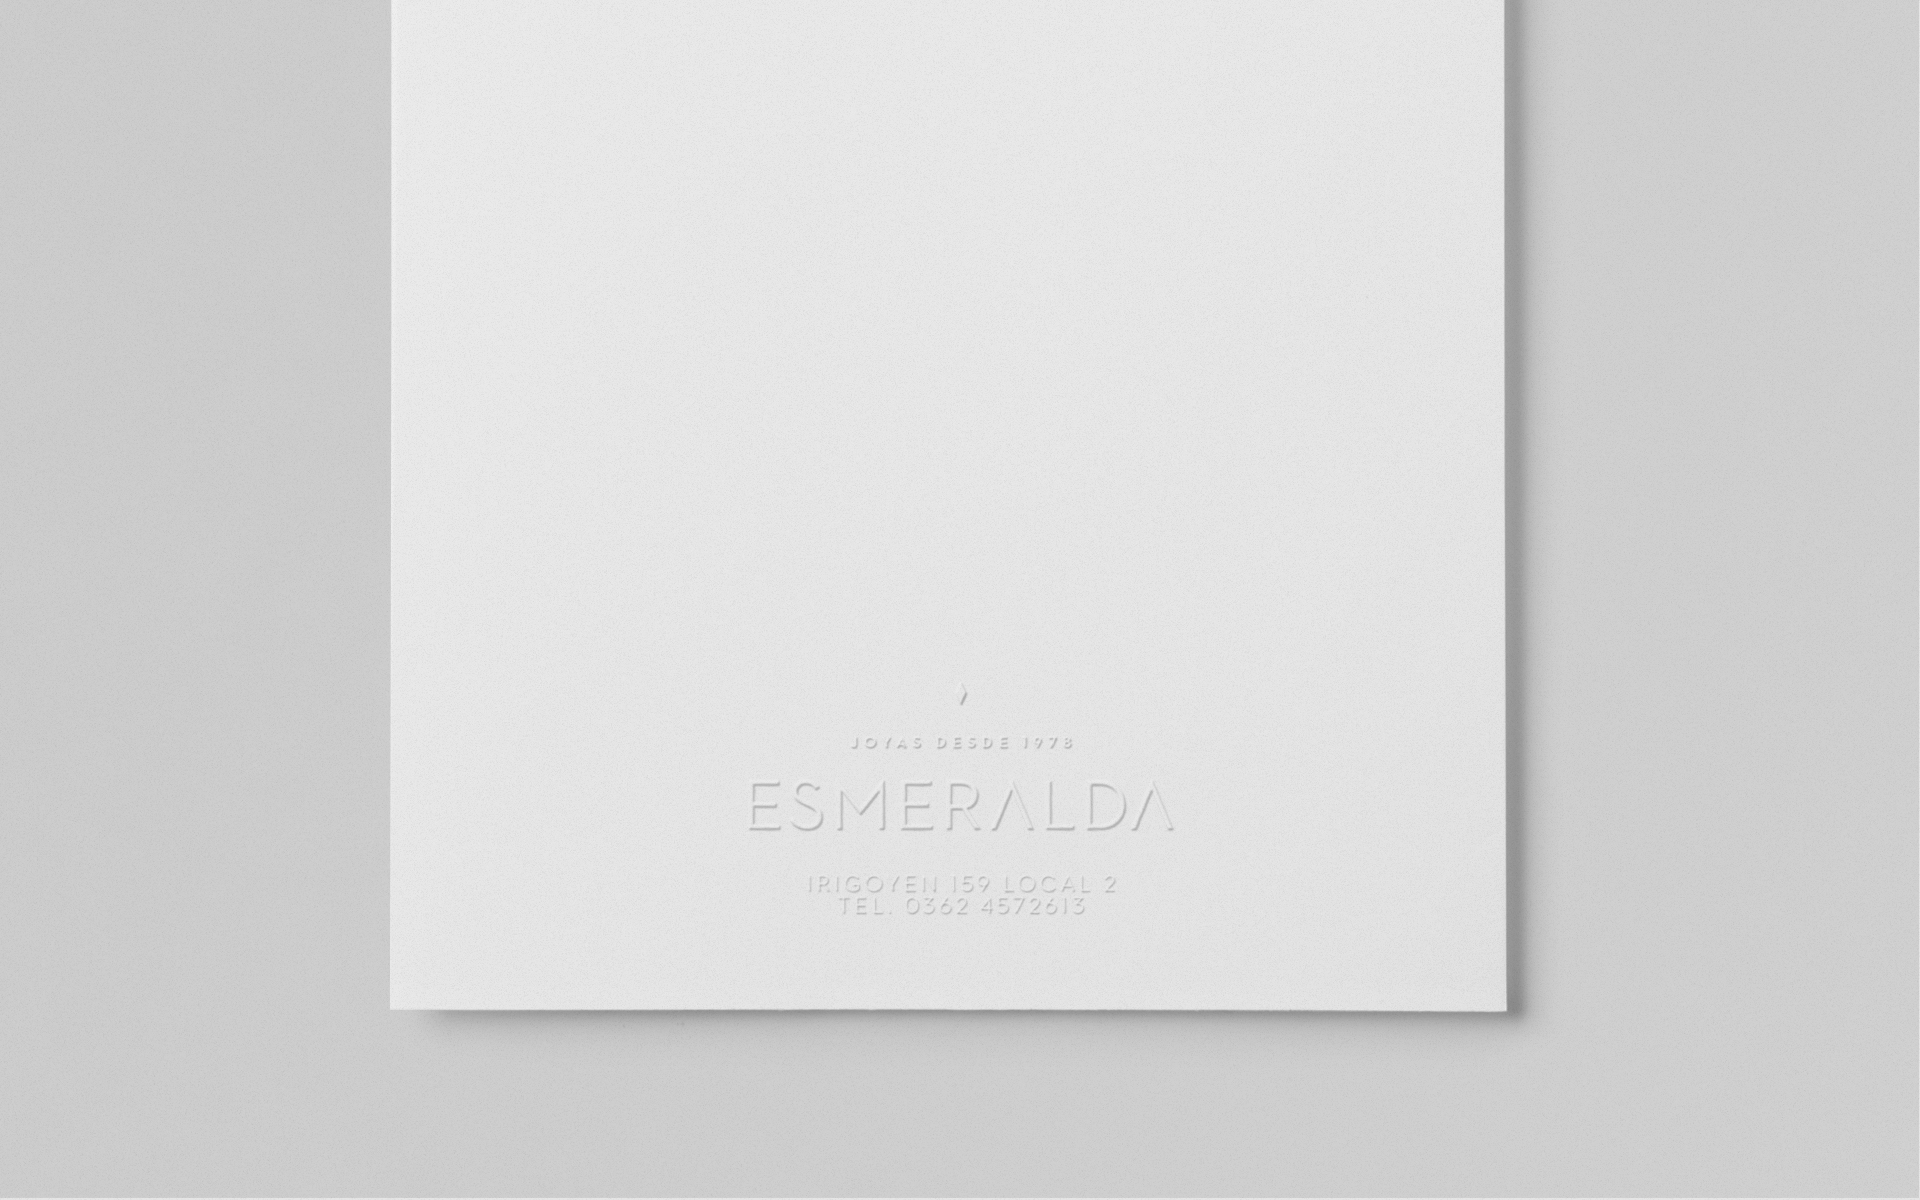 esmeralda-golpe-seco.jpg